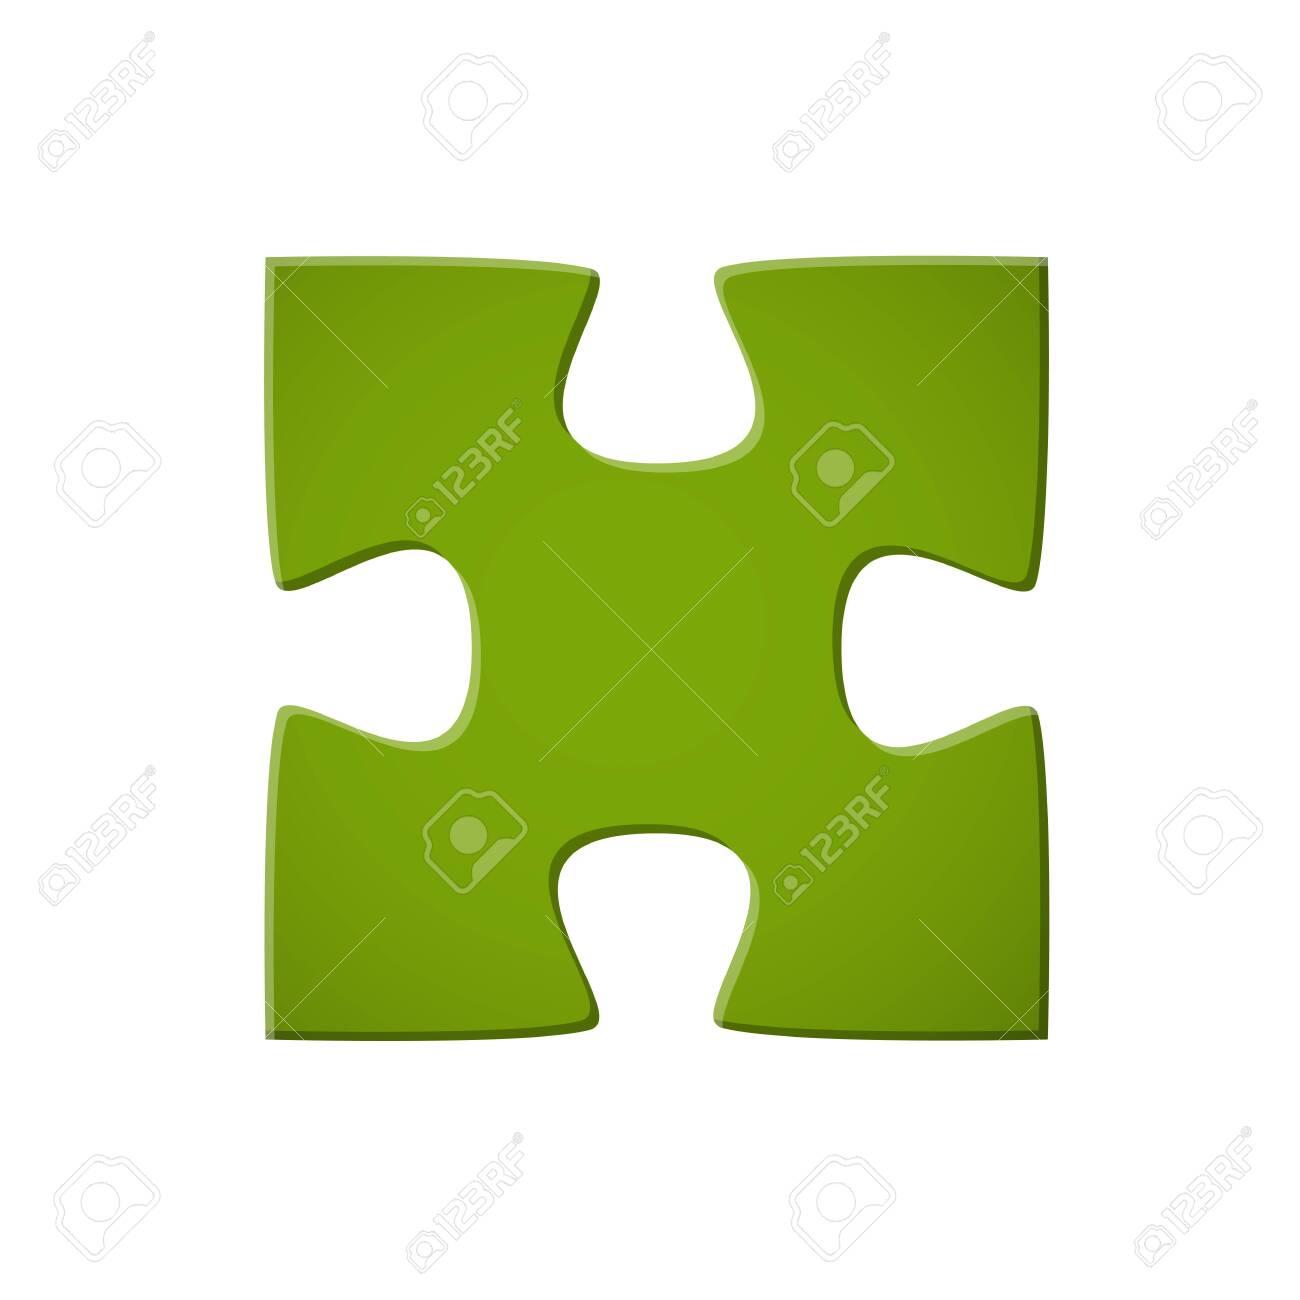 Puzzle piece green - 121237195